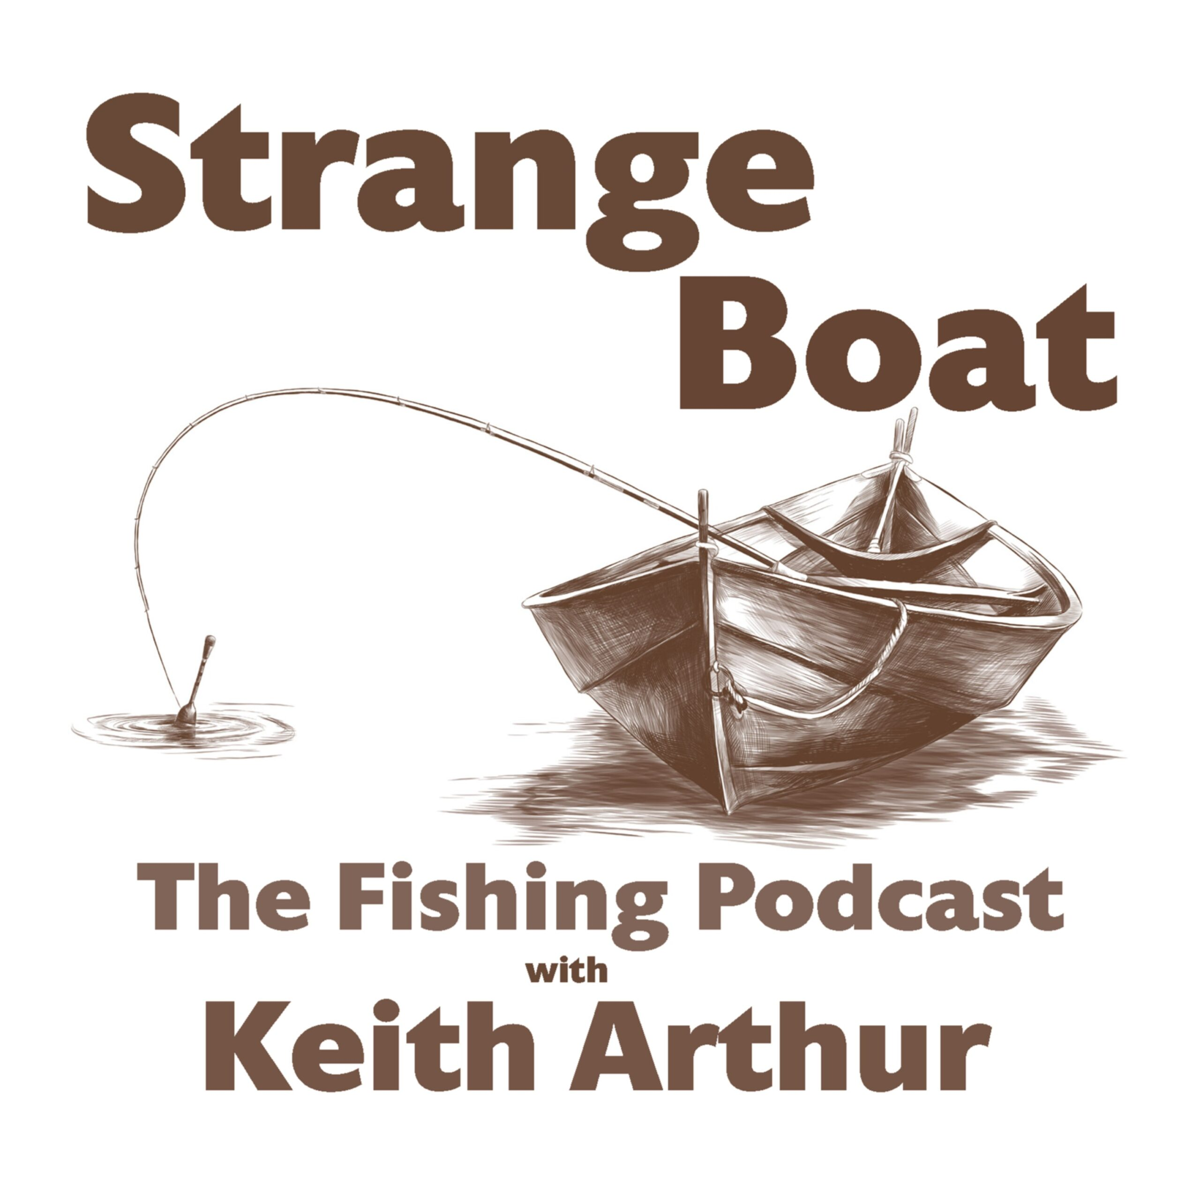 Strange Boat - The Fishing Podcast 17: The Strange Boat sets to sea with Dave Barham